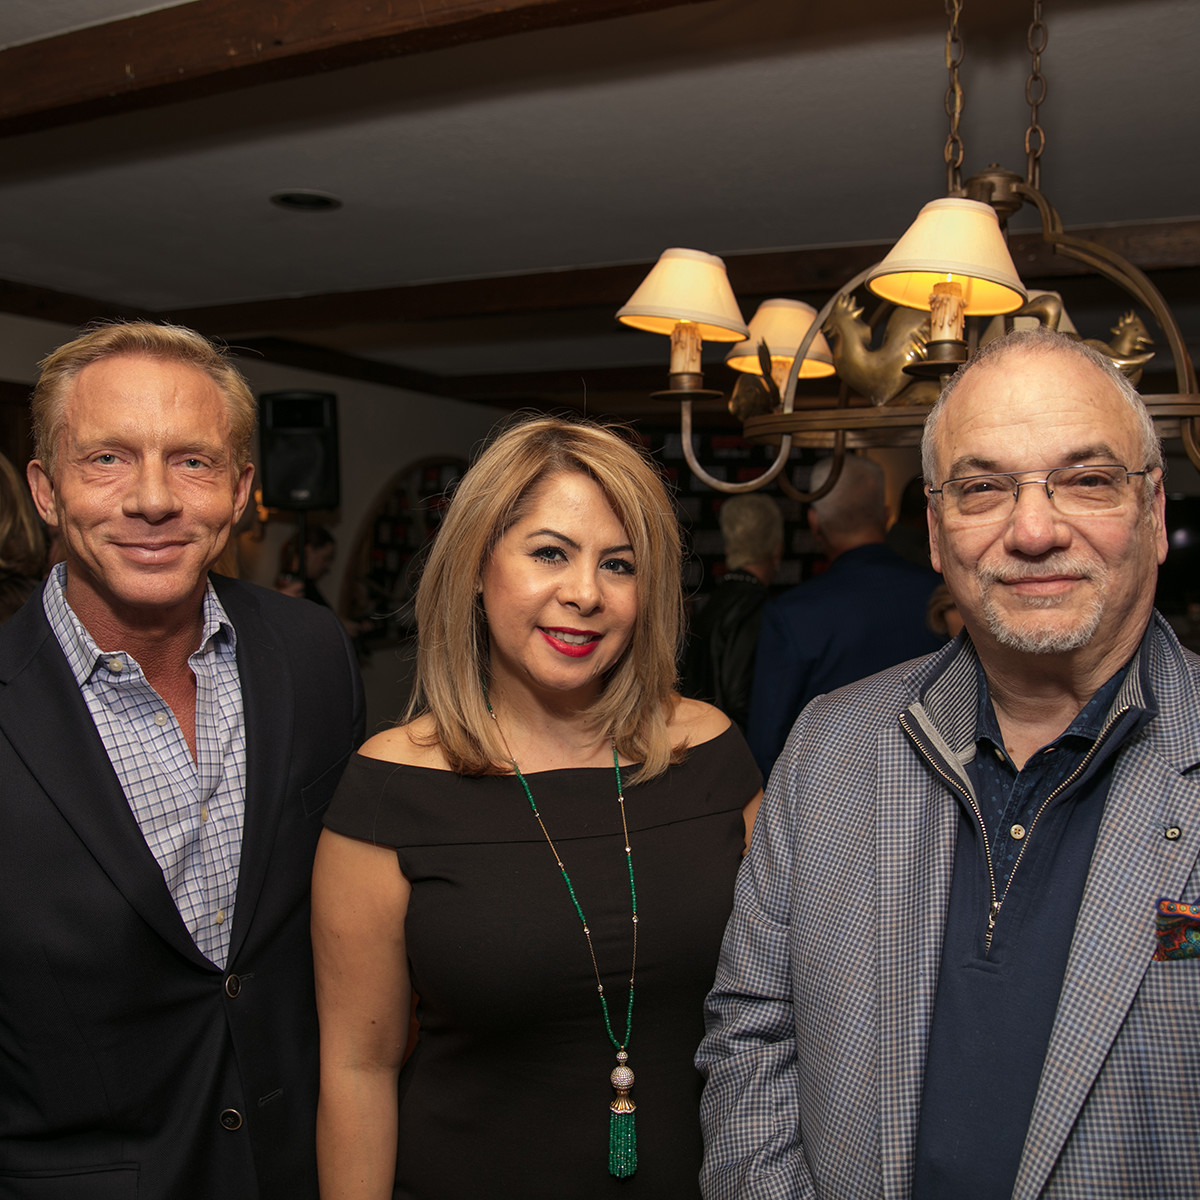 Doug Harris, Esme Perez, Scott Brogan at Big Game Party